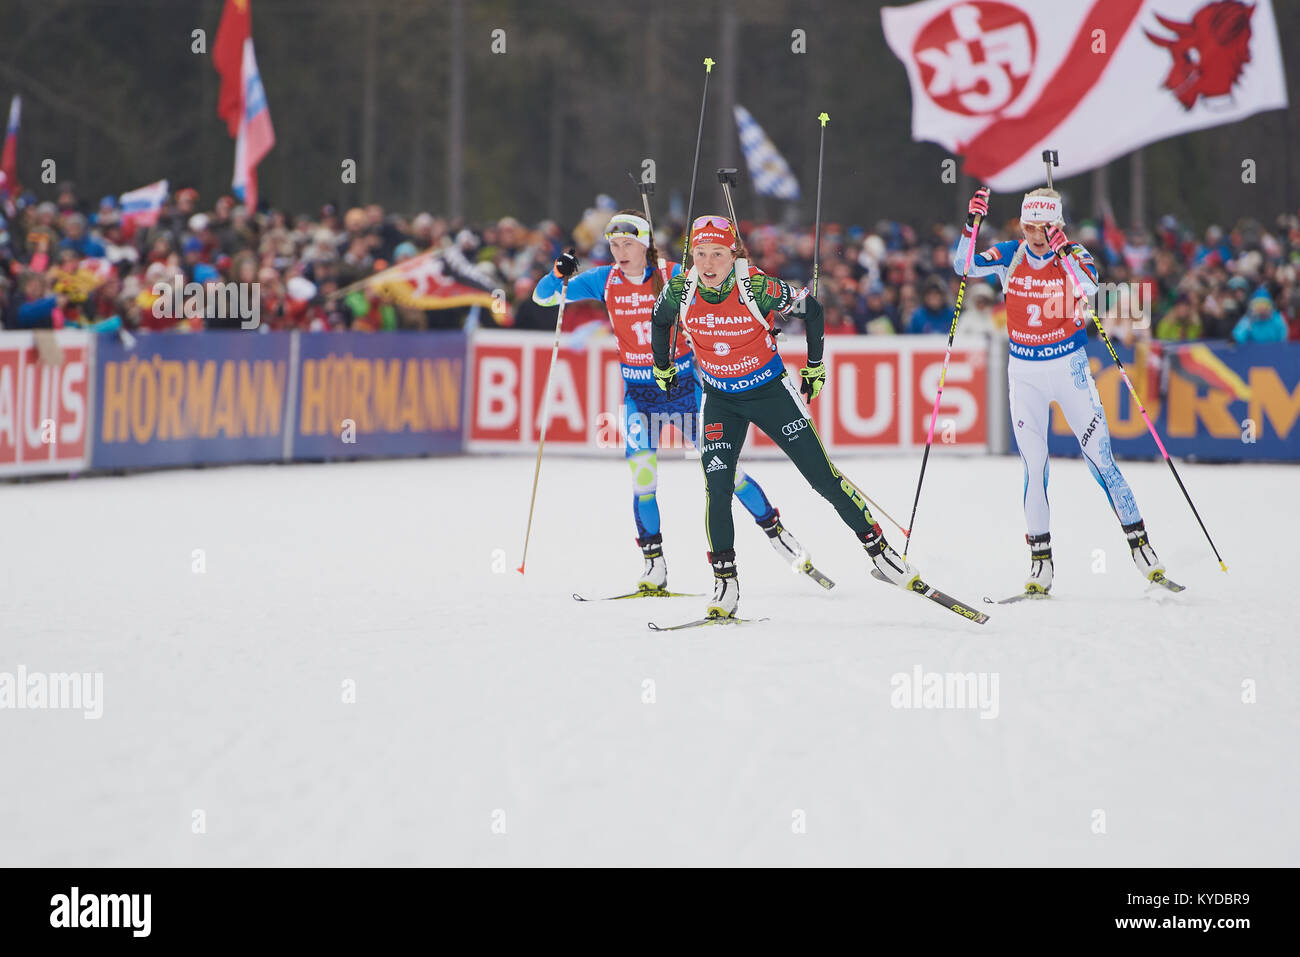 Ruhpolding, Deutschland. 14. Januar 2018. Laura DAHLMEIER (GER) führt (R) MAKARAINEN Kaisa und Darya Domracheva Stockbild